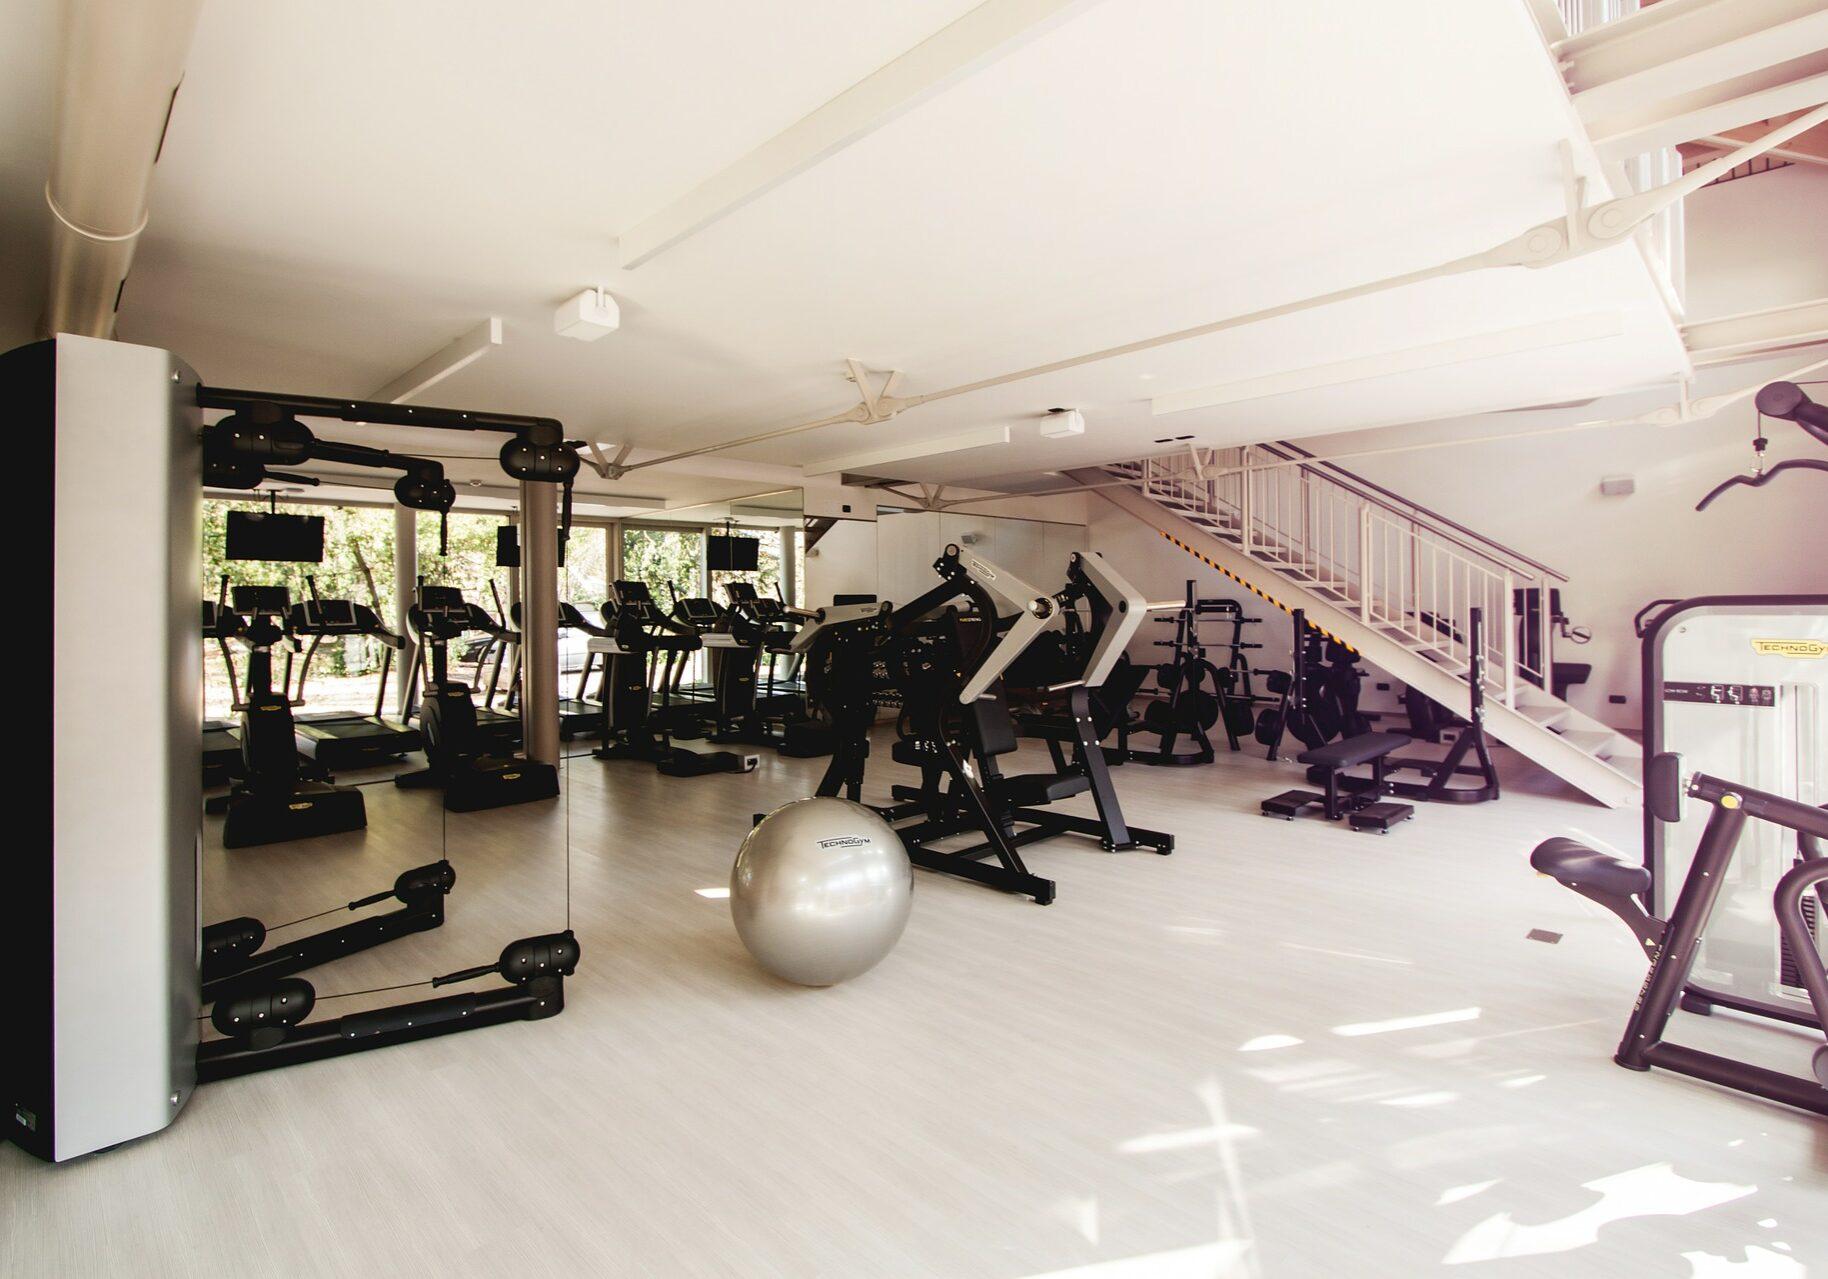 gym-595597_1920